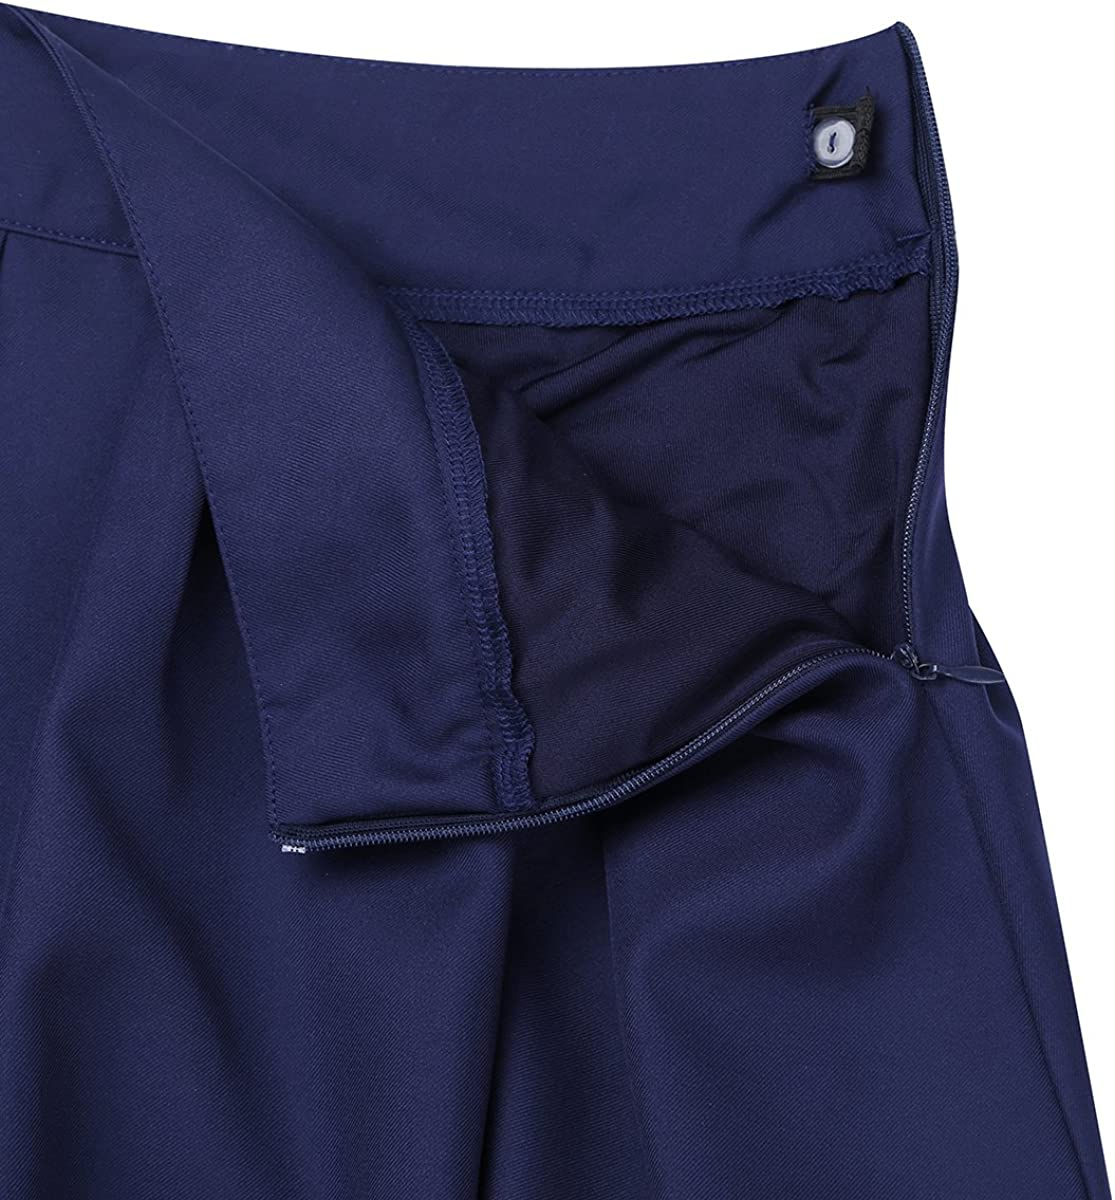 MSemis Girls Kids Pleated Plaid Tartan Billie Kilt Skirt with Leather Buckled Straps Classic School Uniforms Mini Skirts